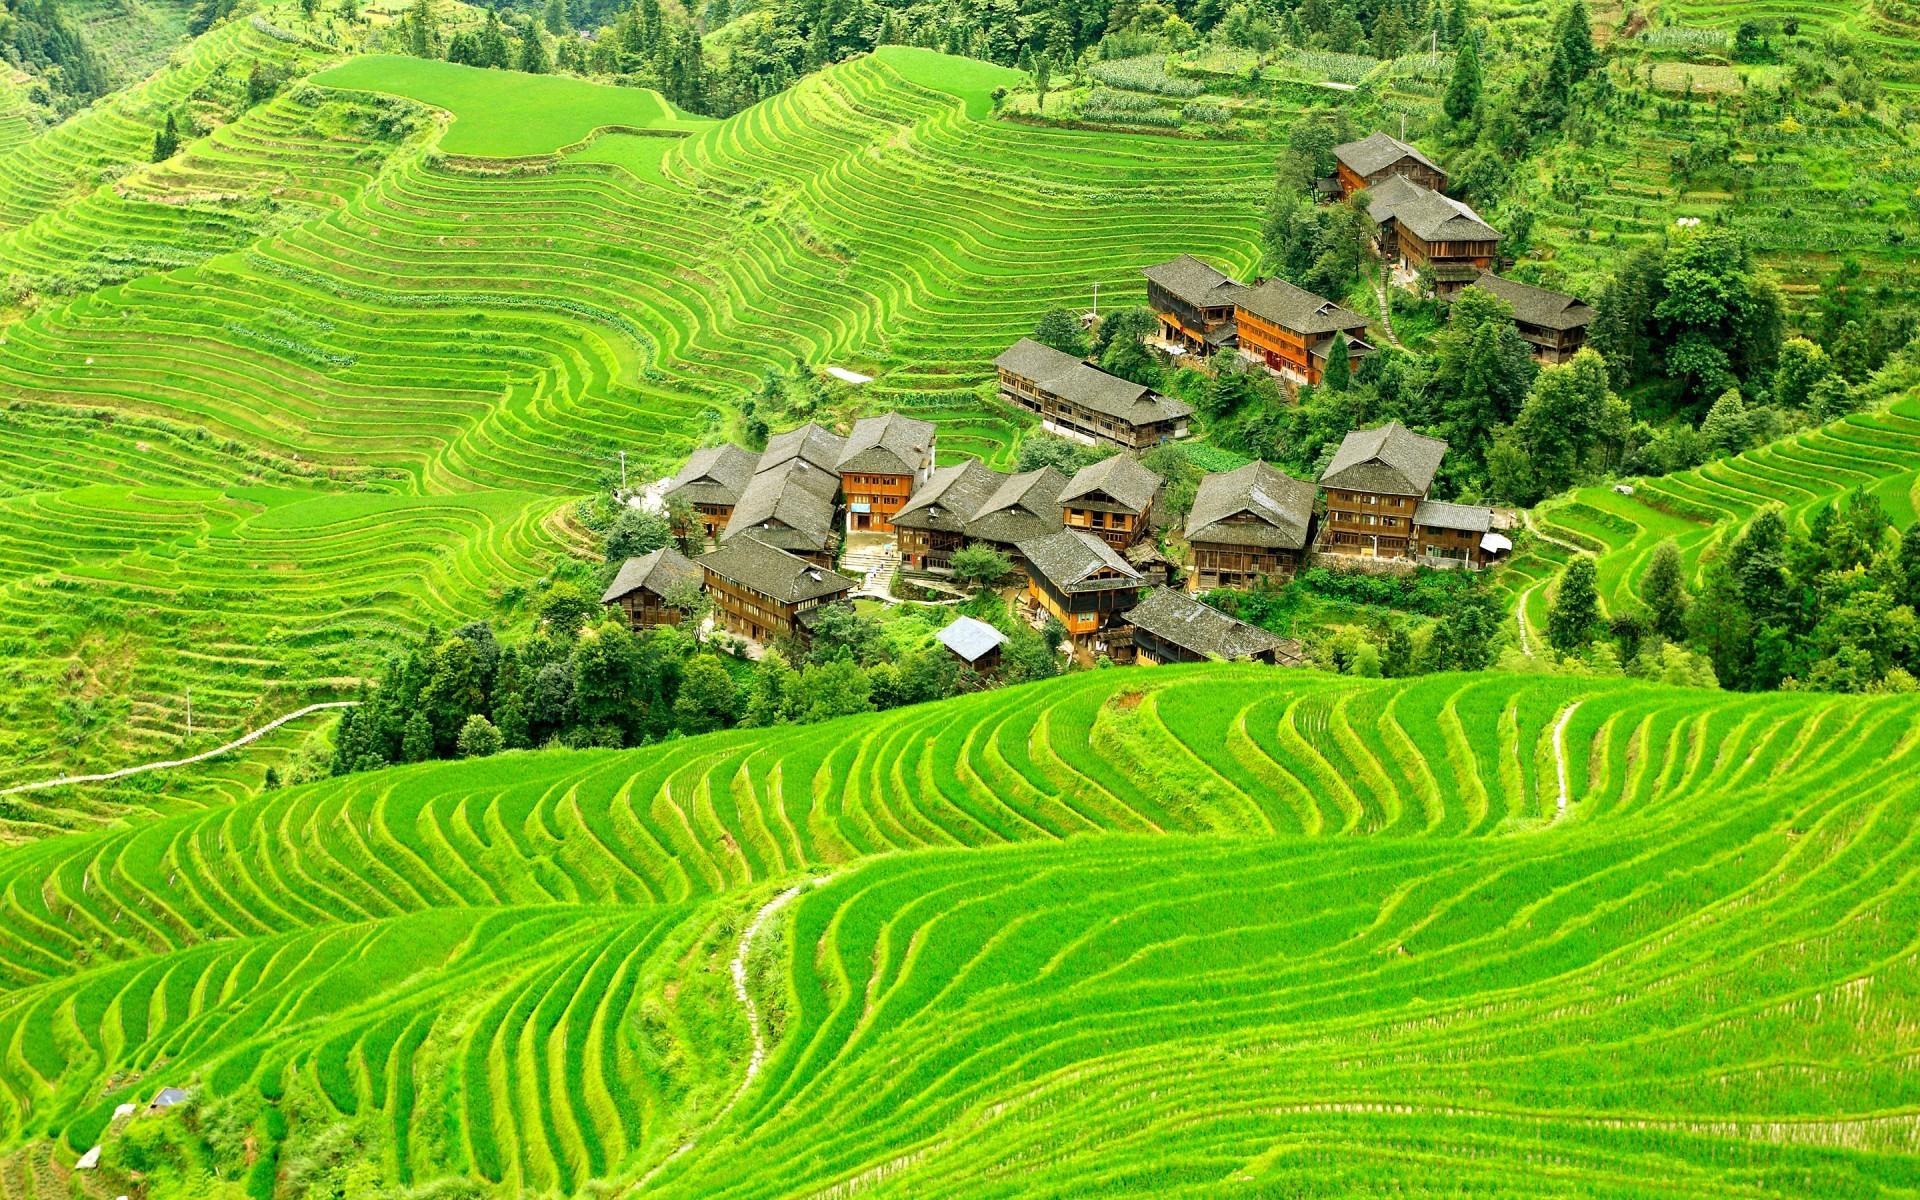 Fondos De Pantalla Paisaje China Naturaleza Verde